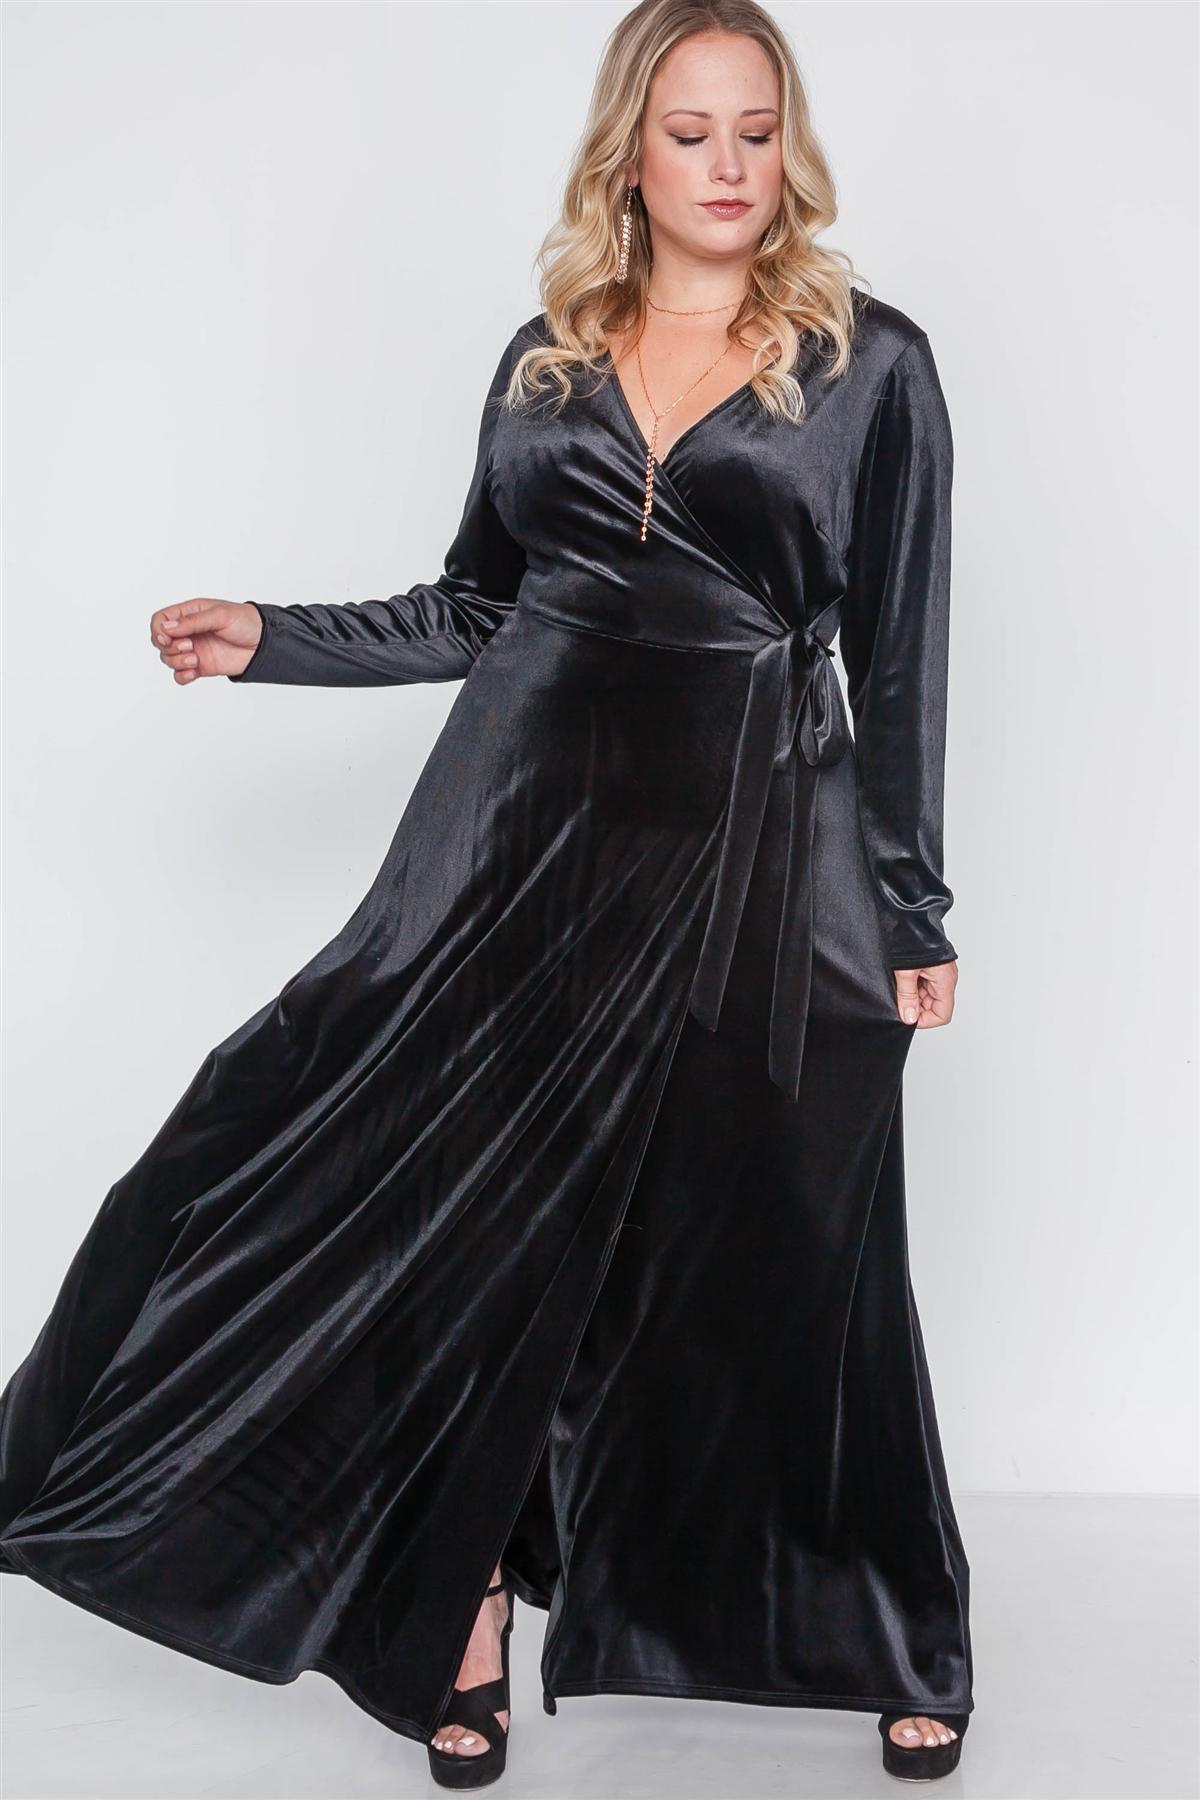 Plus Size Black Velvet Surplice Neck Maxi Dress /2-2-2